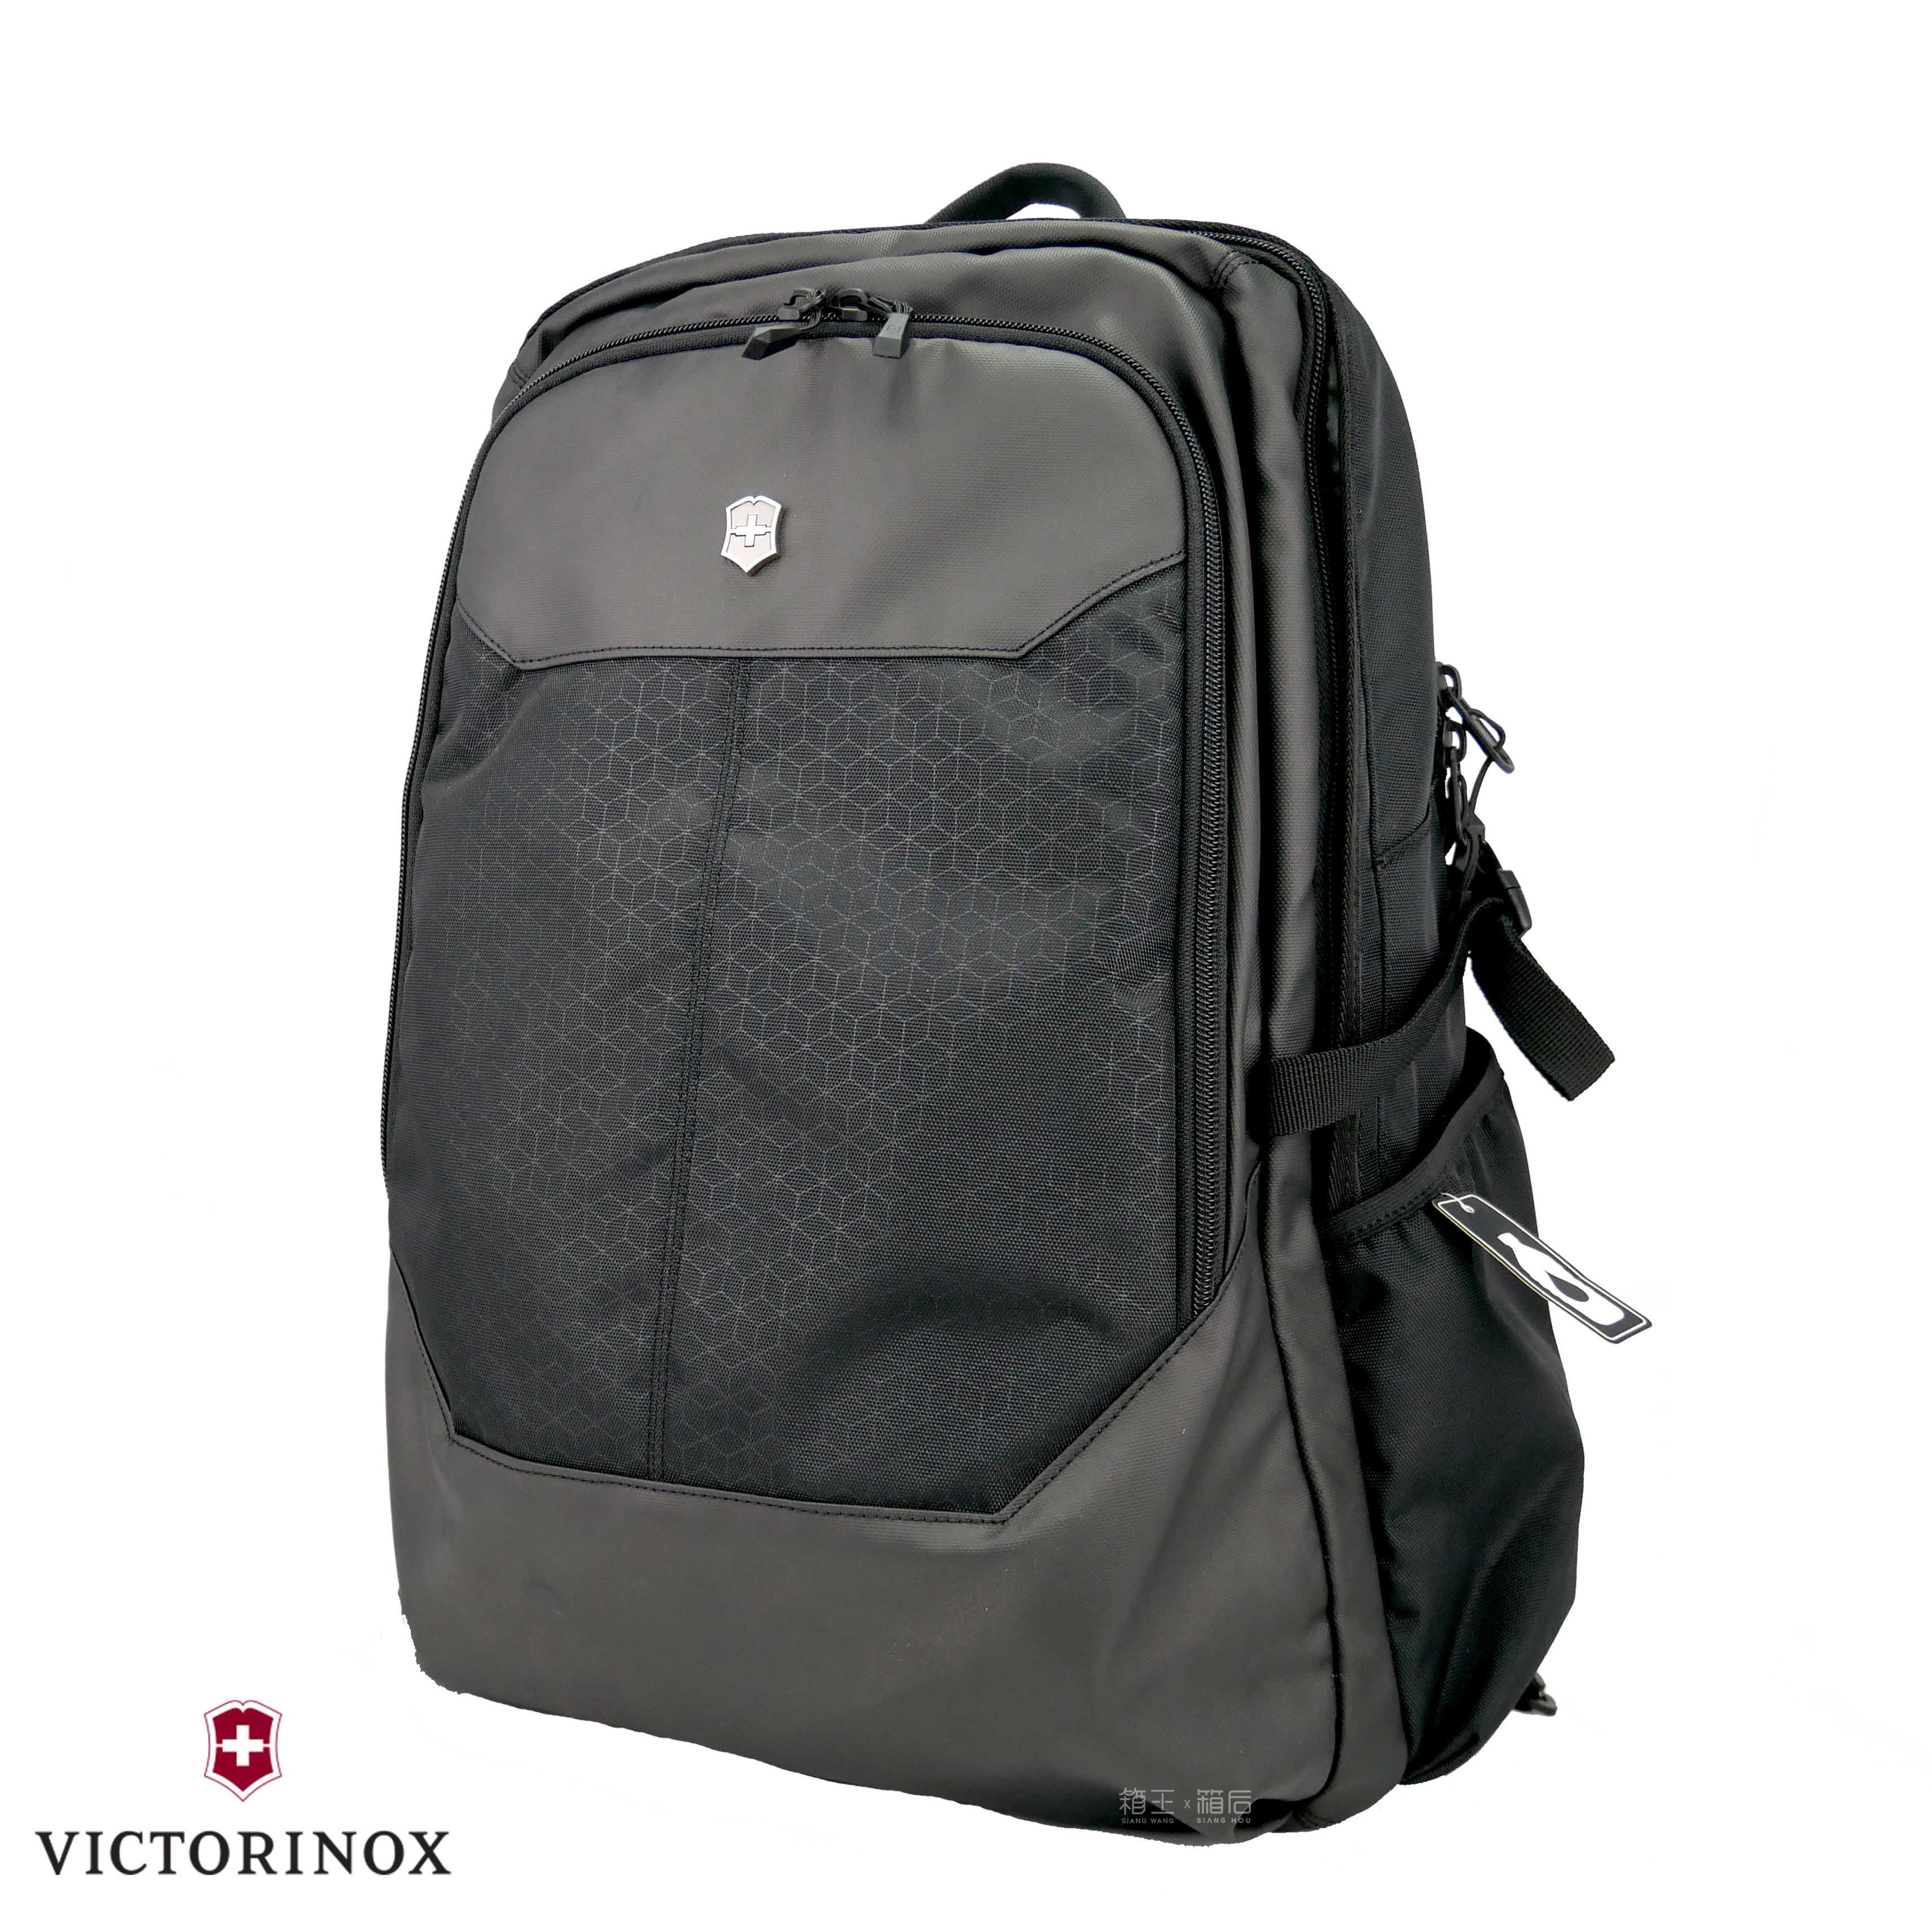 VICTORINOX 瑞士維氏 16吋電腦後背包 平板後背包 可插拉桿後背包 商務包 雙肩後背包 TRGE-606733